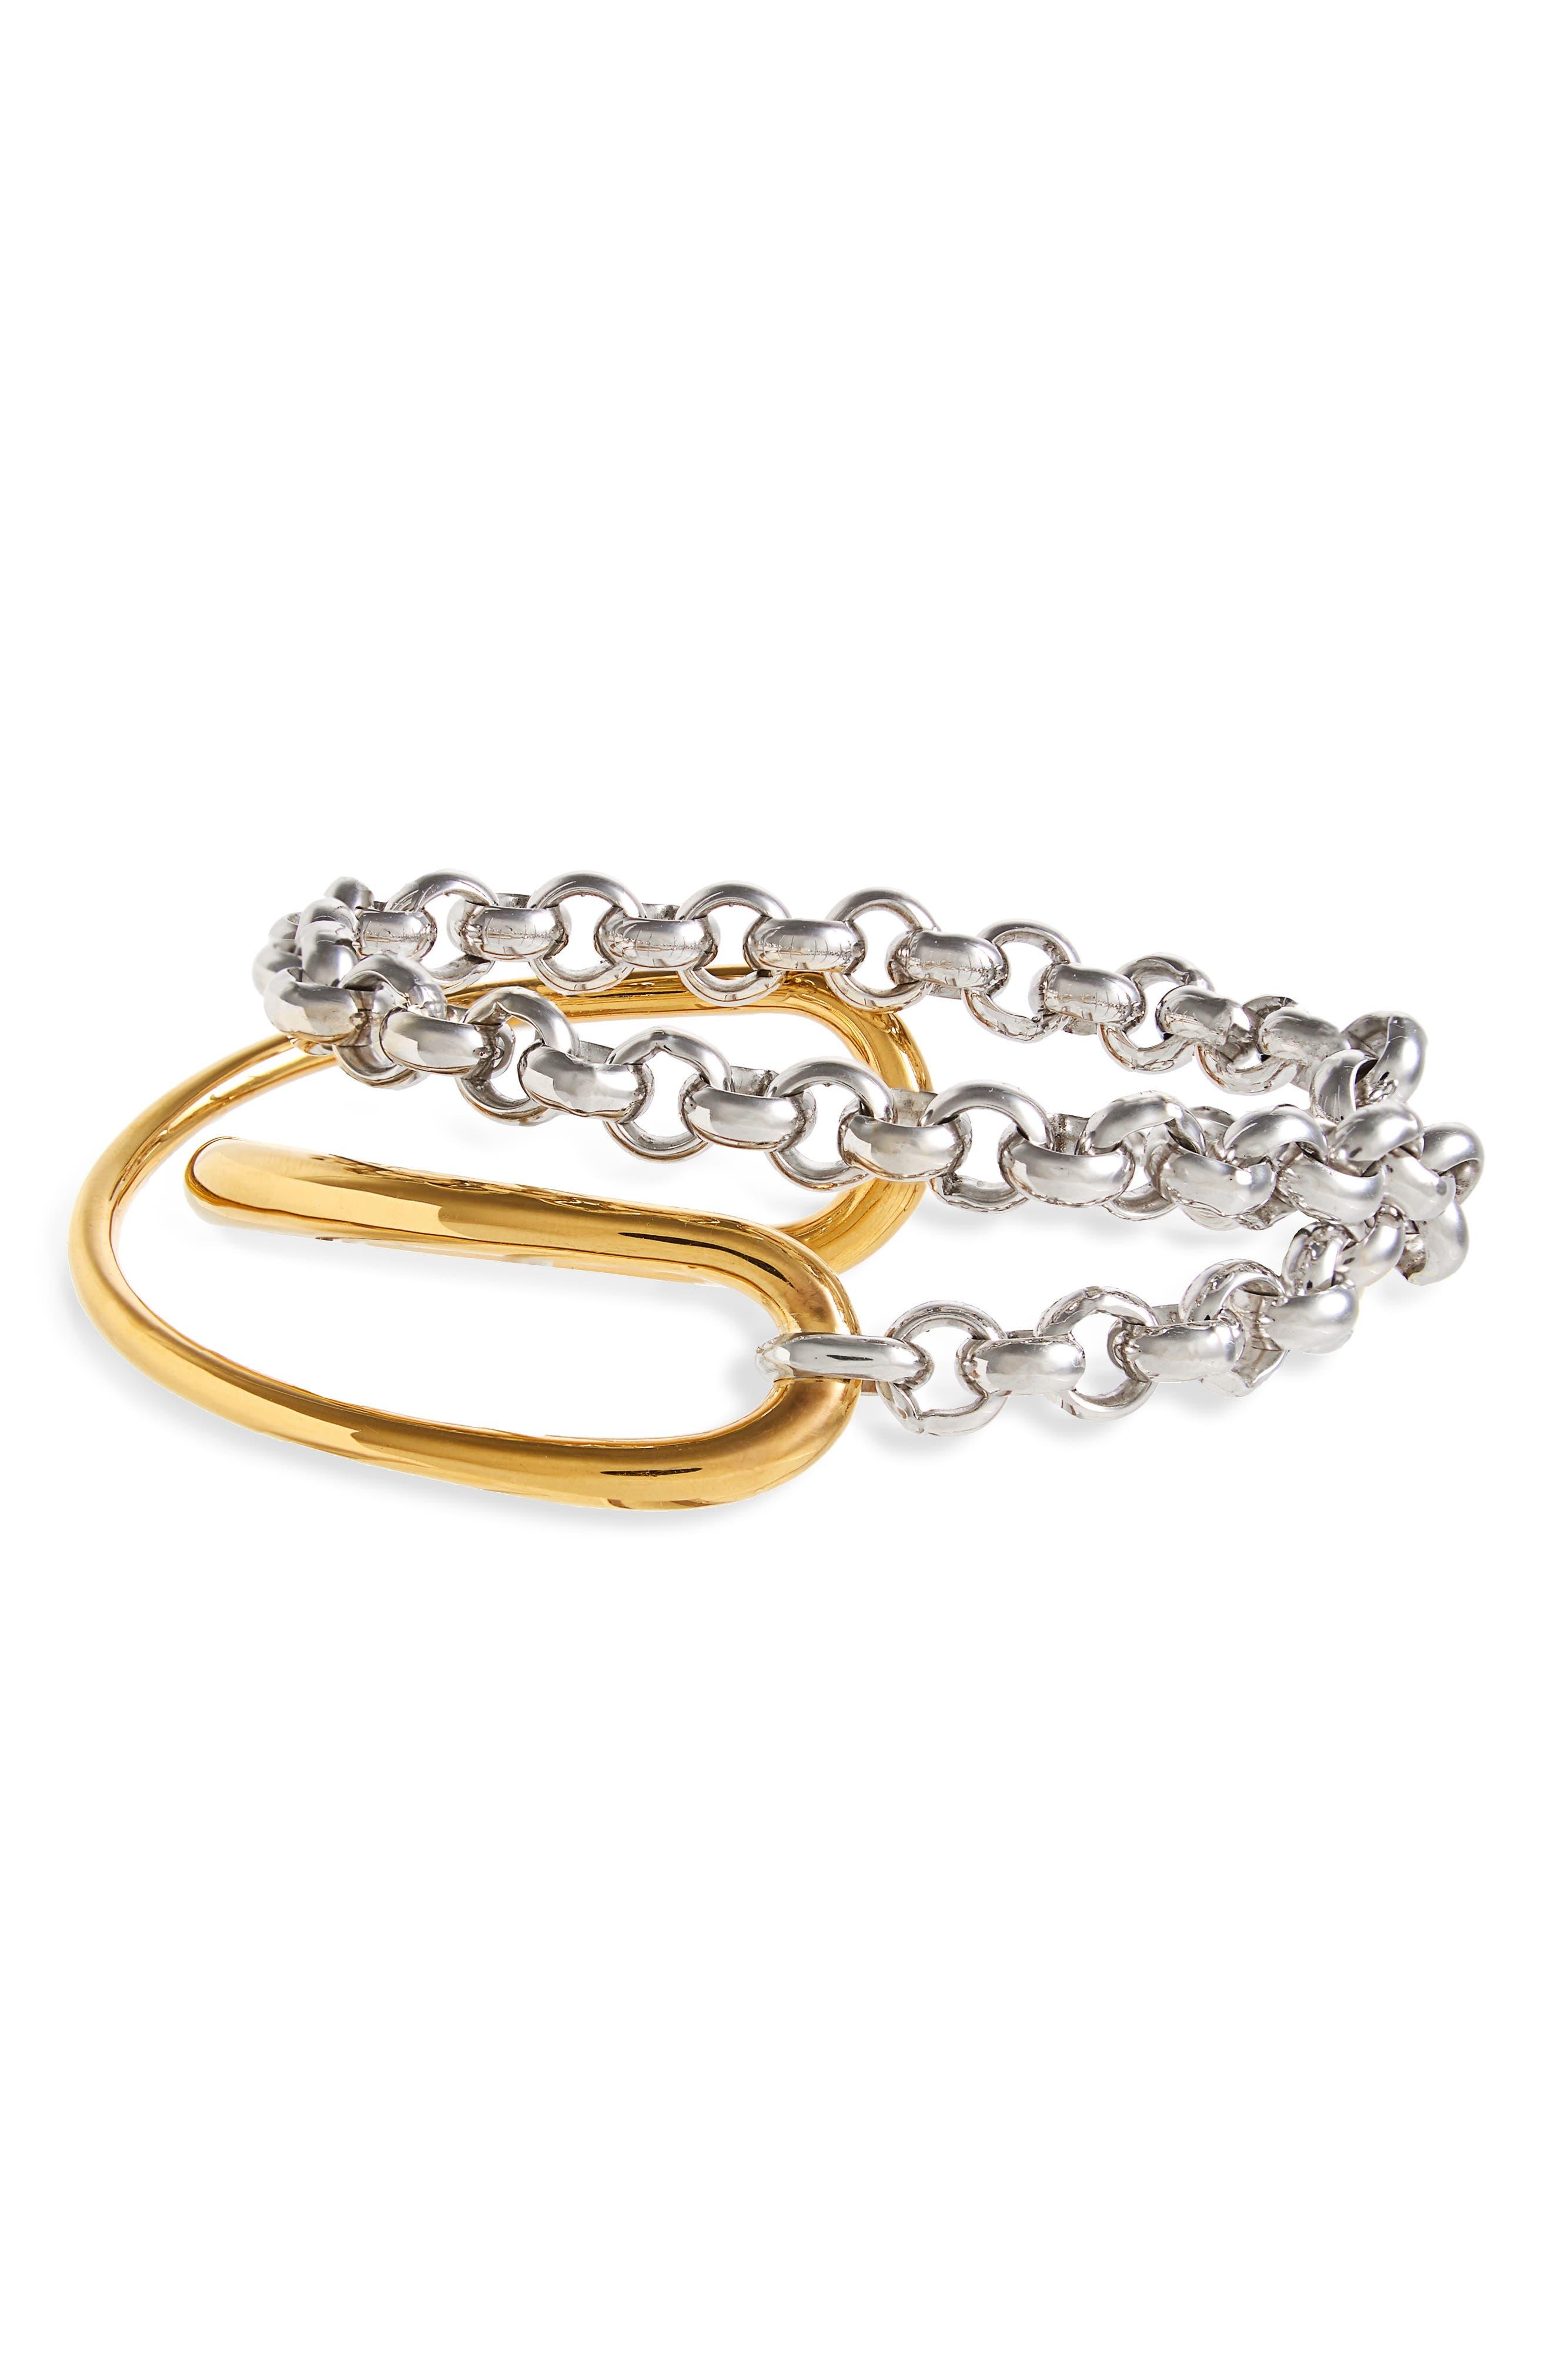 Charlotte Chenais Initial Chain Bracelet,                             Main thumbnail 1, color,                             YELLOW SILVER